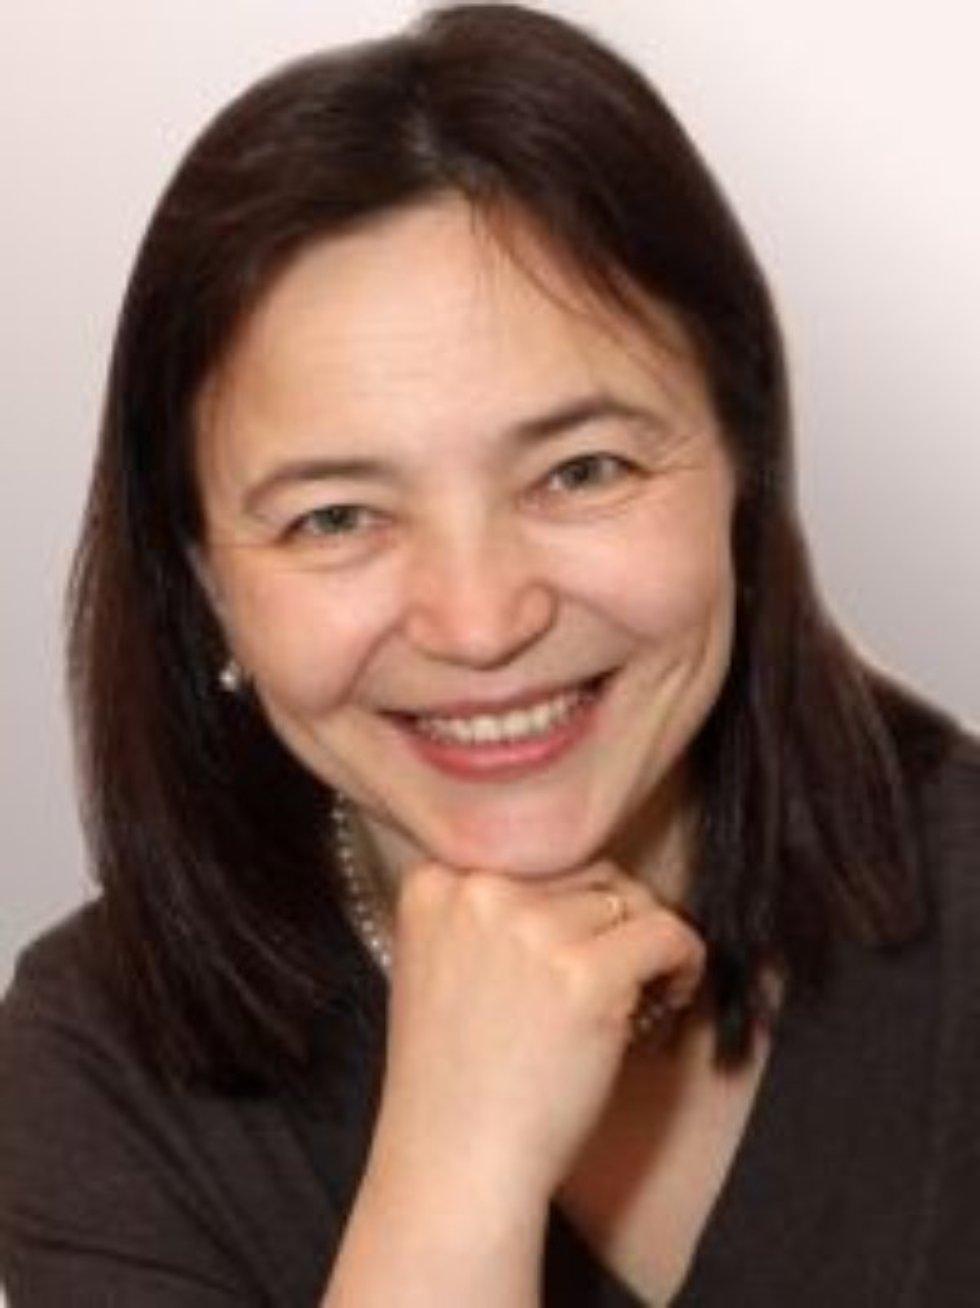 Ziganshina Liliya Eugenevna